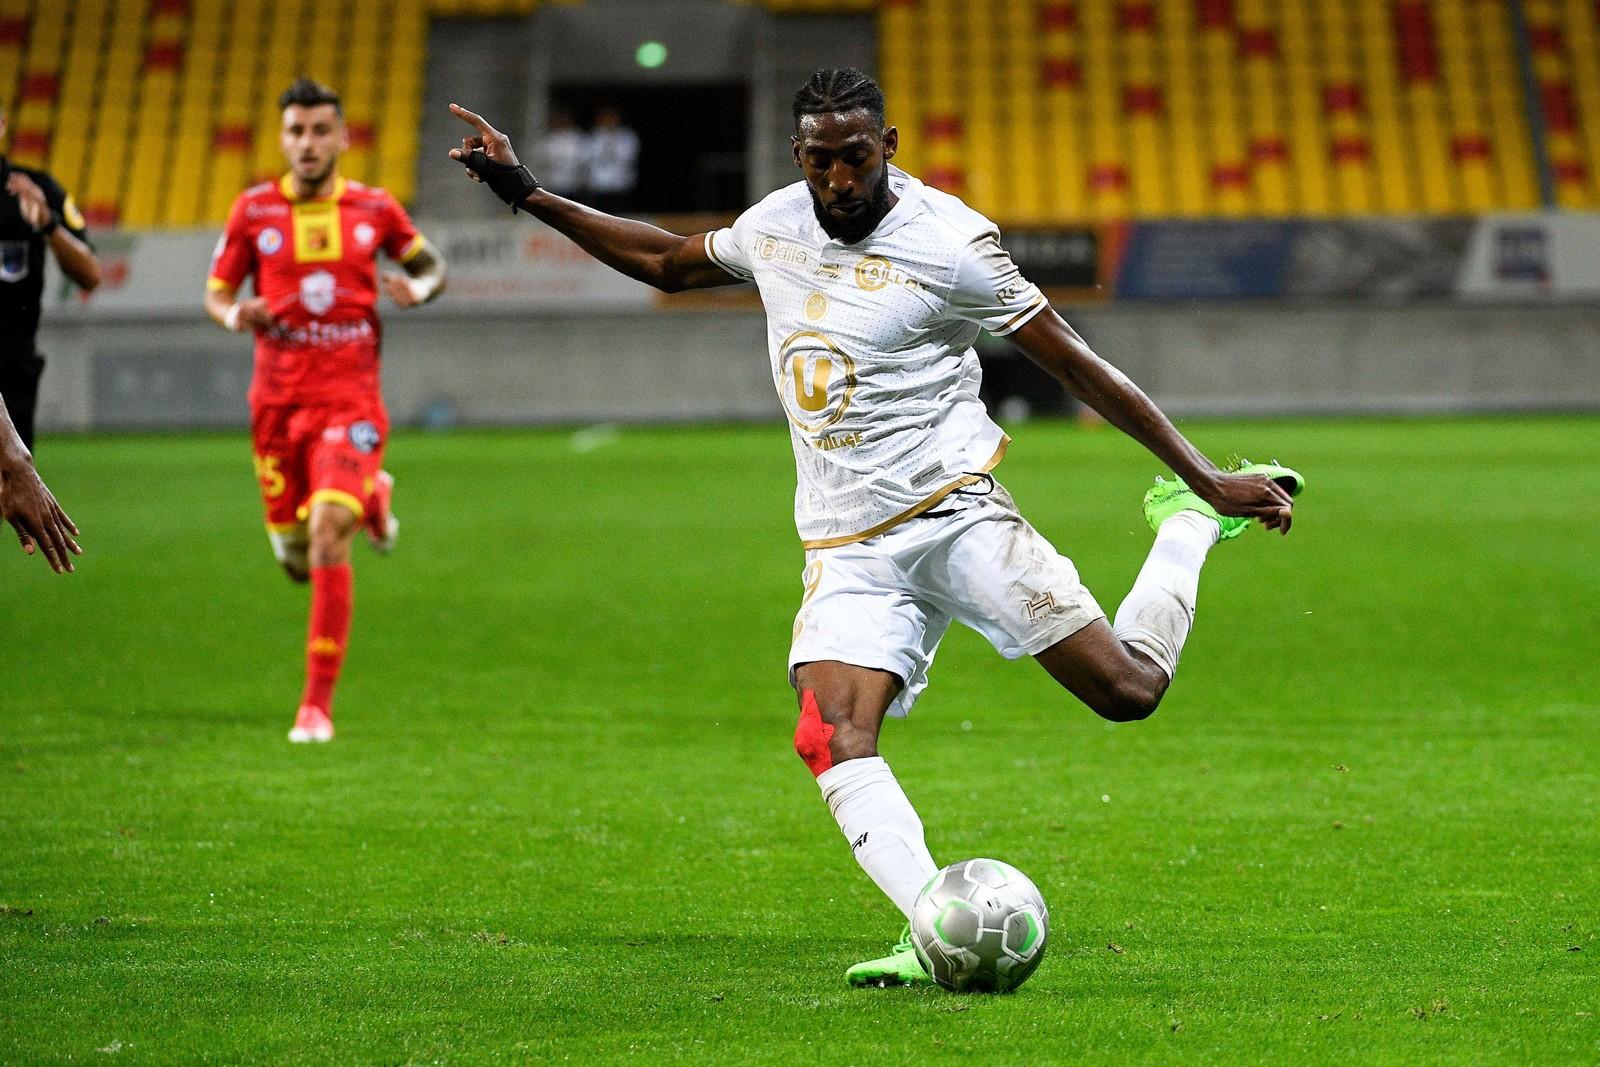 Anatole Ngamukol bei Stade Reims